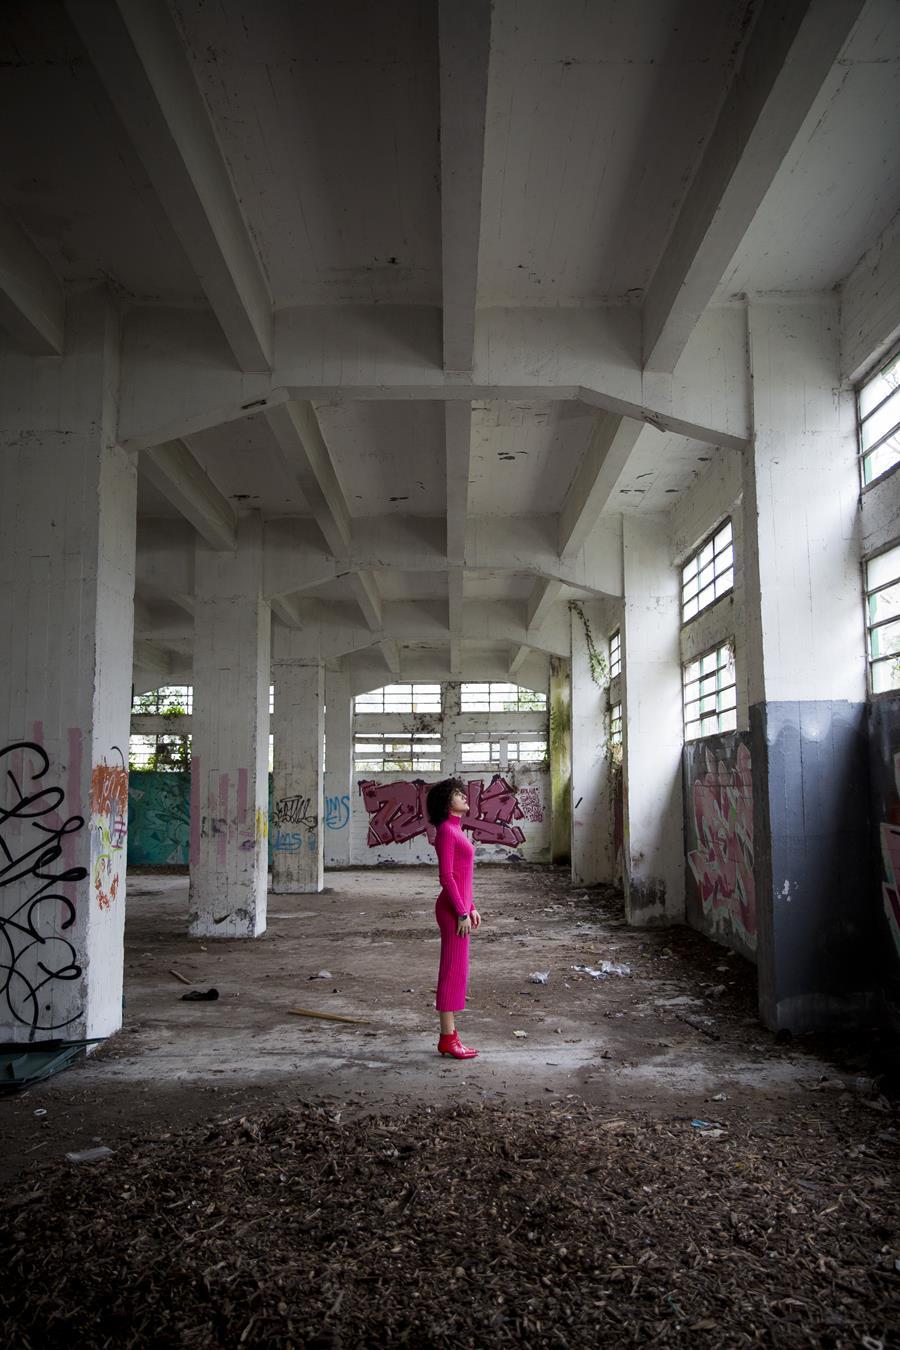 Rebeca Valdivia, asesora de imagen, personal shopper, estilista, stilist, influencer, Donostia, San Sebastián, Miss Clov, la blogger indie, influencer, dress, vestido canalé, rosa, pink, botines rojos, tomboystyle, graffiti